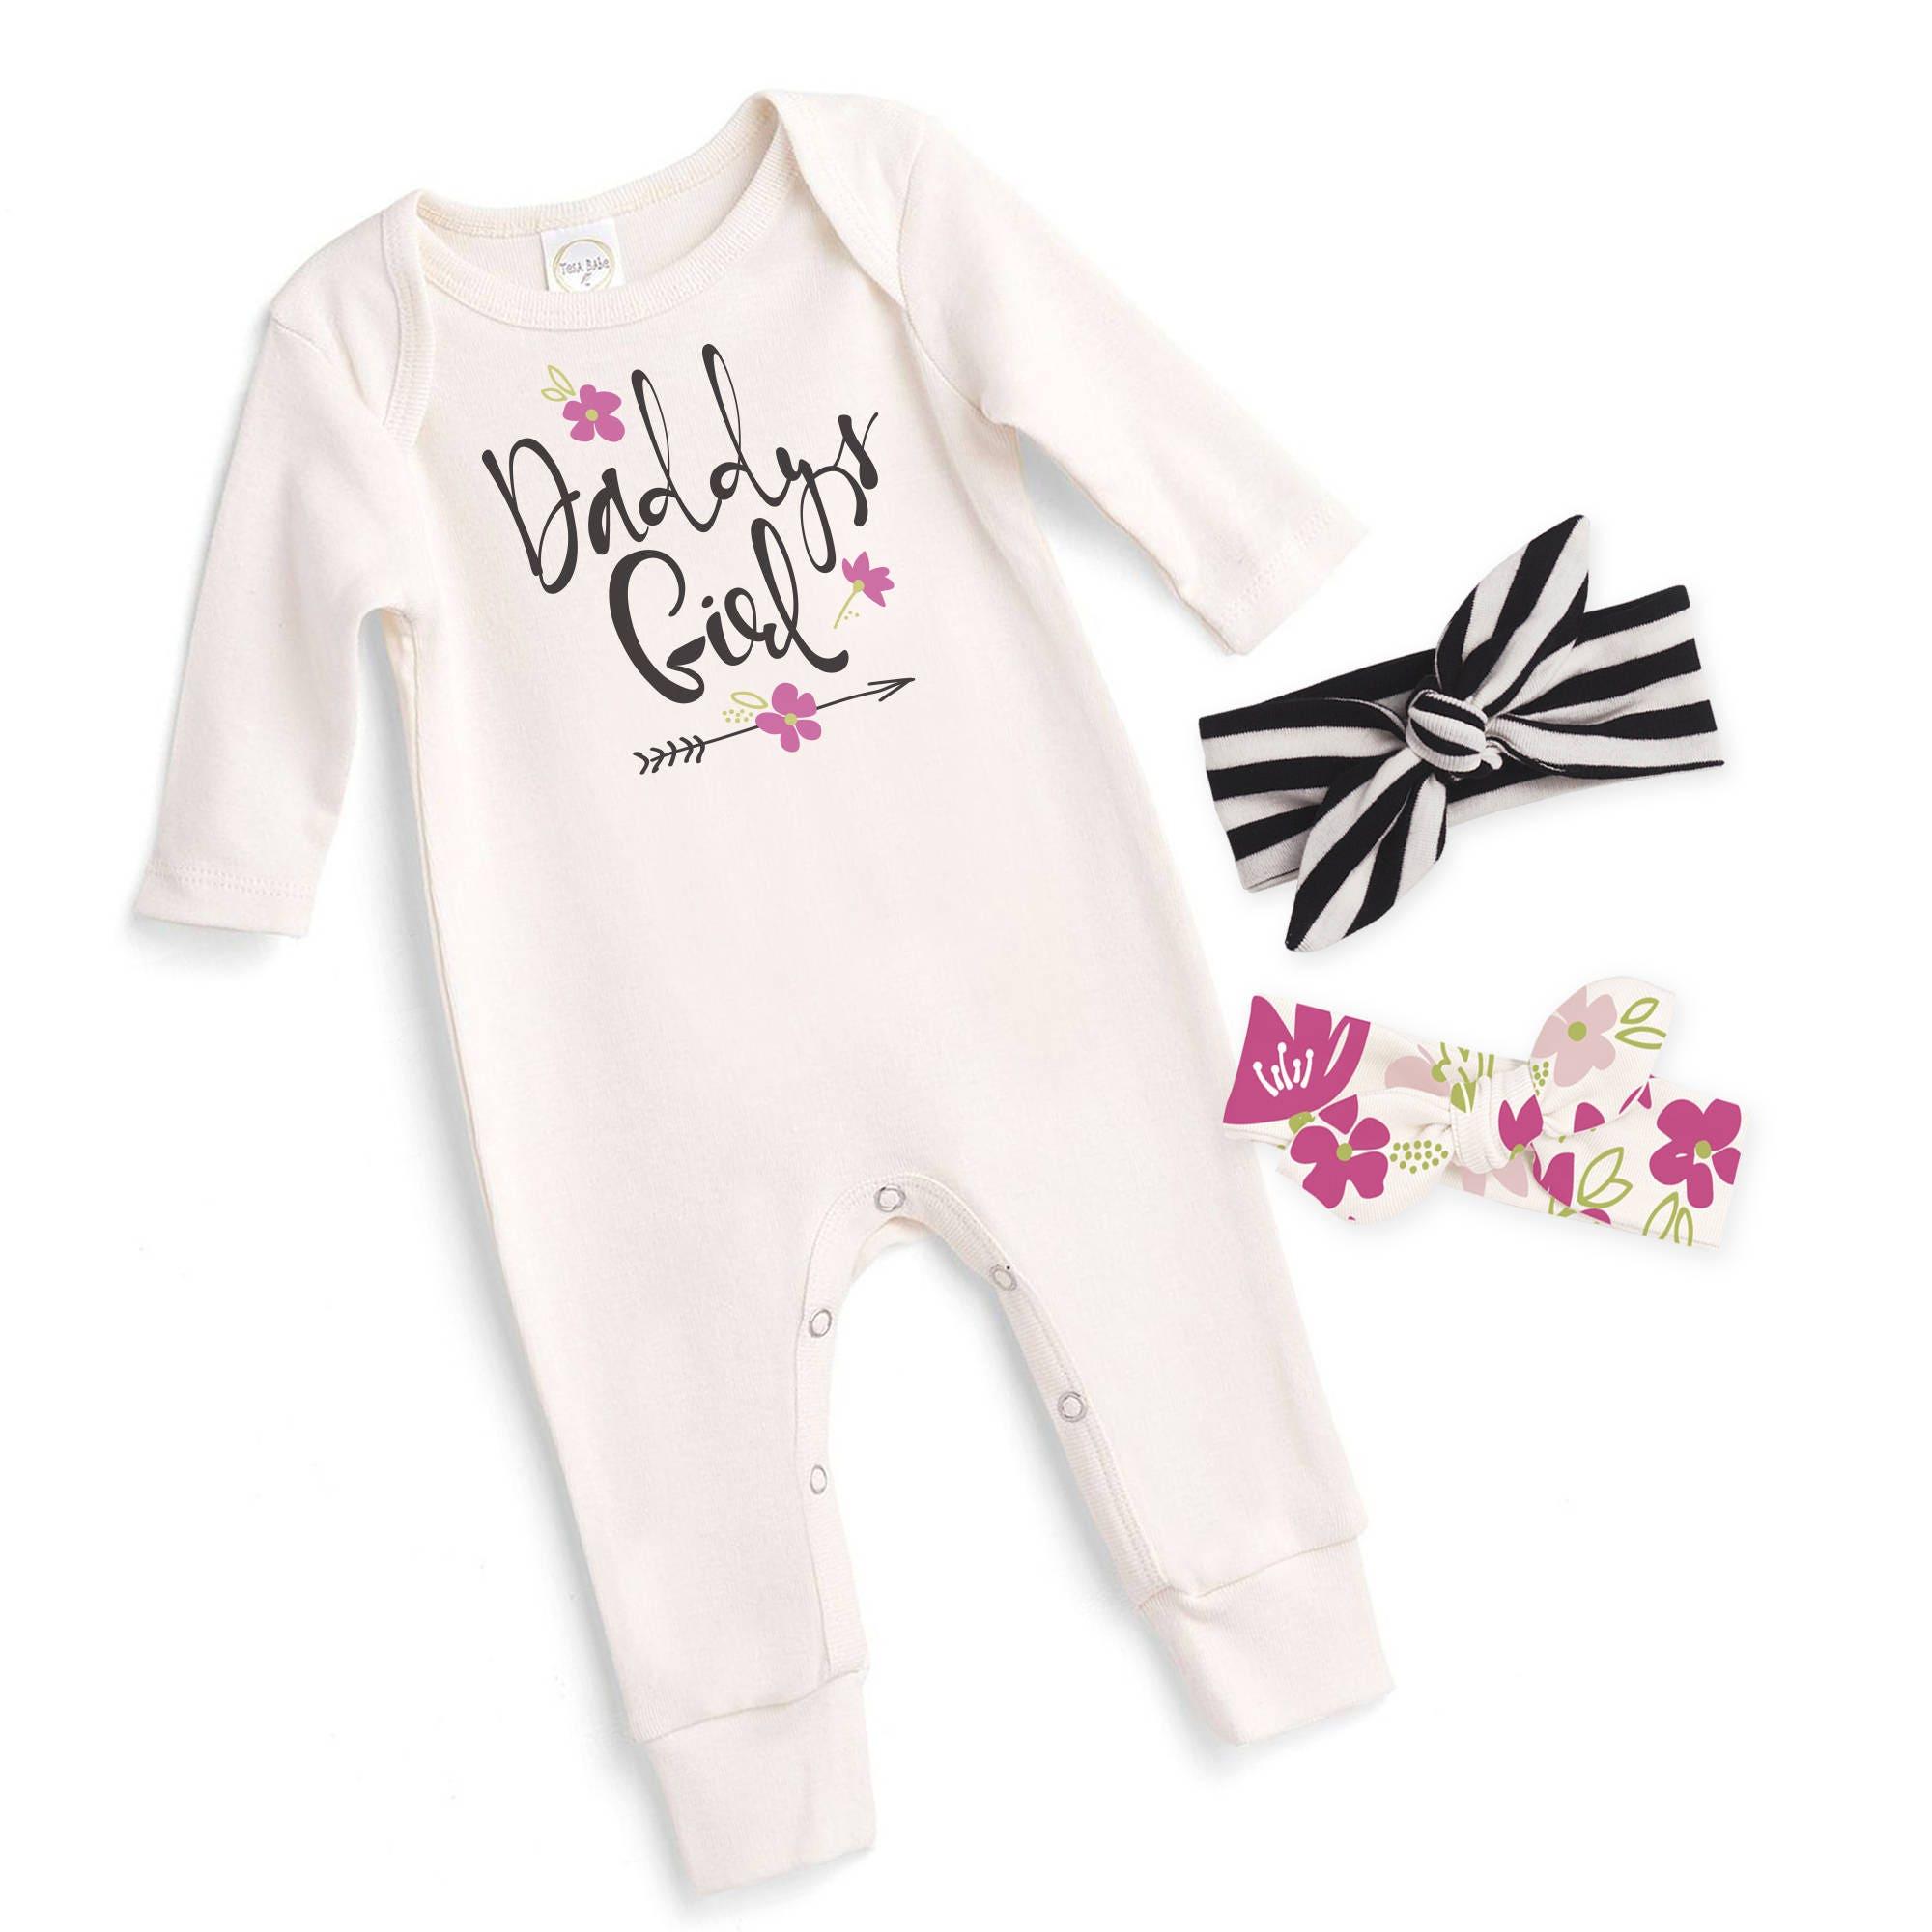 895d184d7 Baby Girls  Clothing